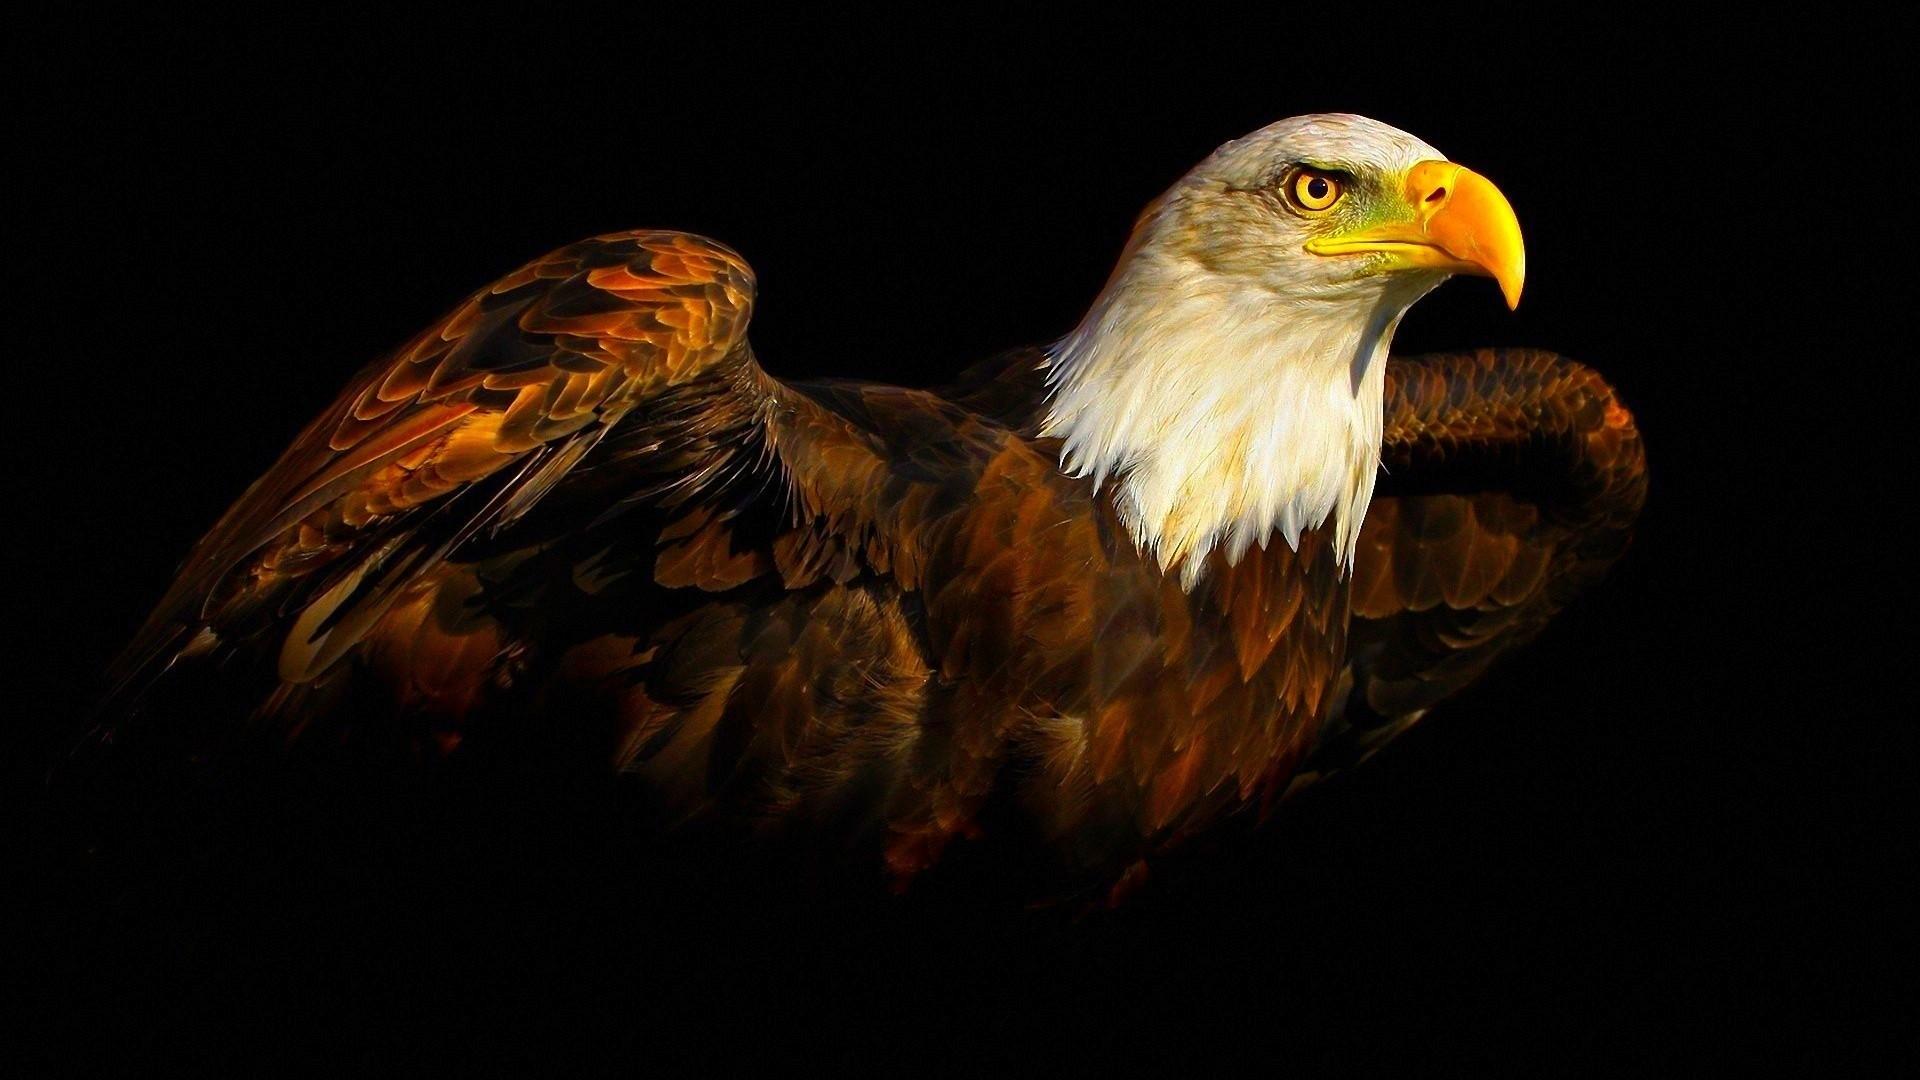 Eagle Birds Animals Black Background 1920x1080